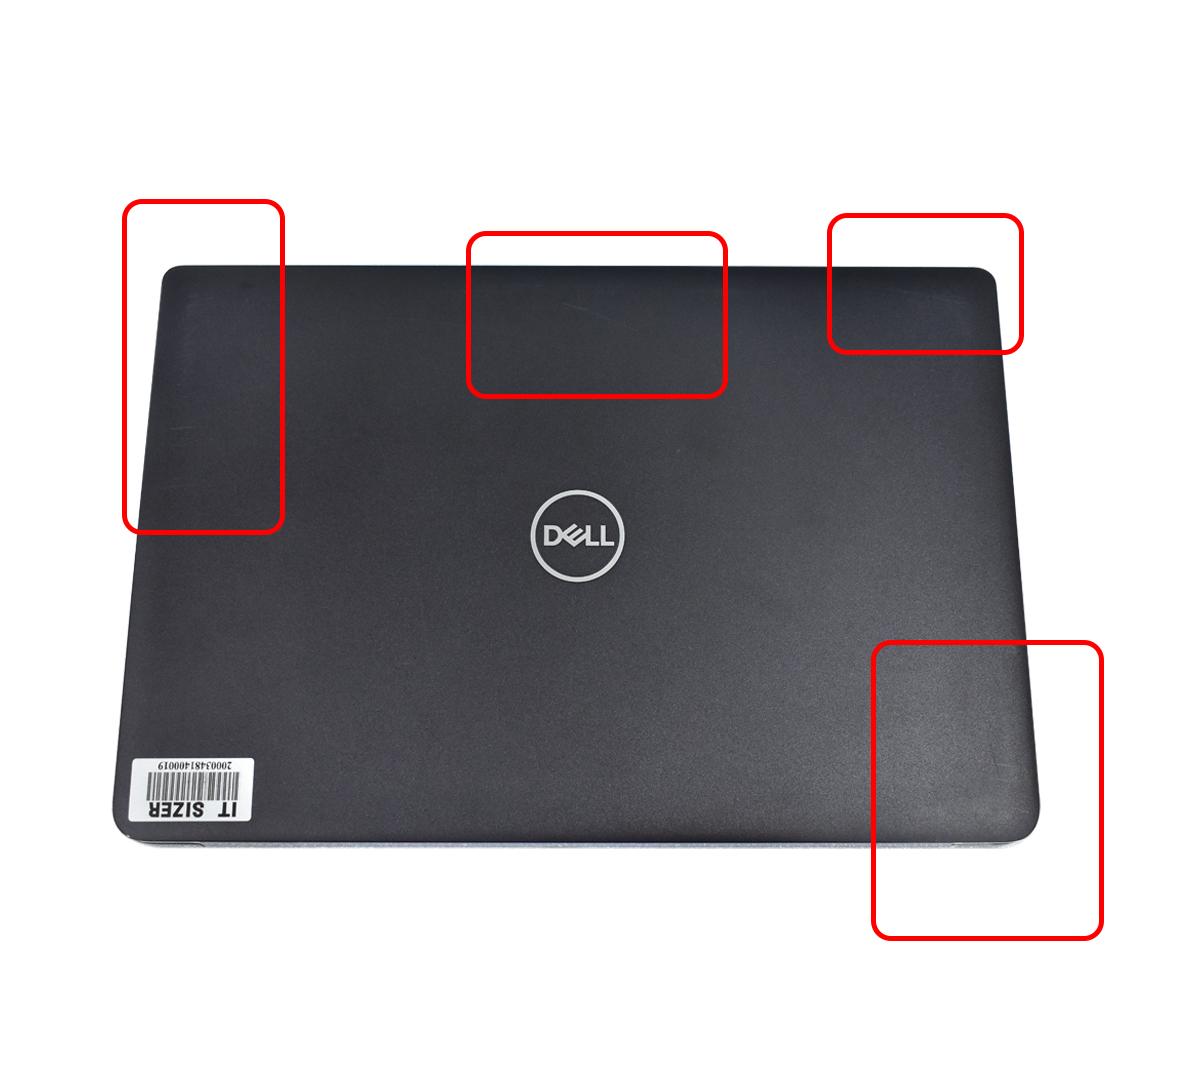 Dell Latitude 3500 14 Non-Touch Business Laptop, Intel Core i7-8565U CPU, 8GB DDR4 SODIMM RAM, 256GB SSD M2, 15 inch Display, Windows 10 Pro (Refurbished)